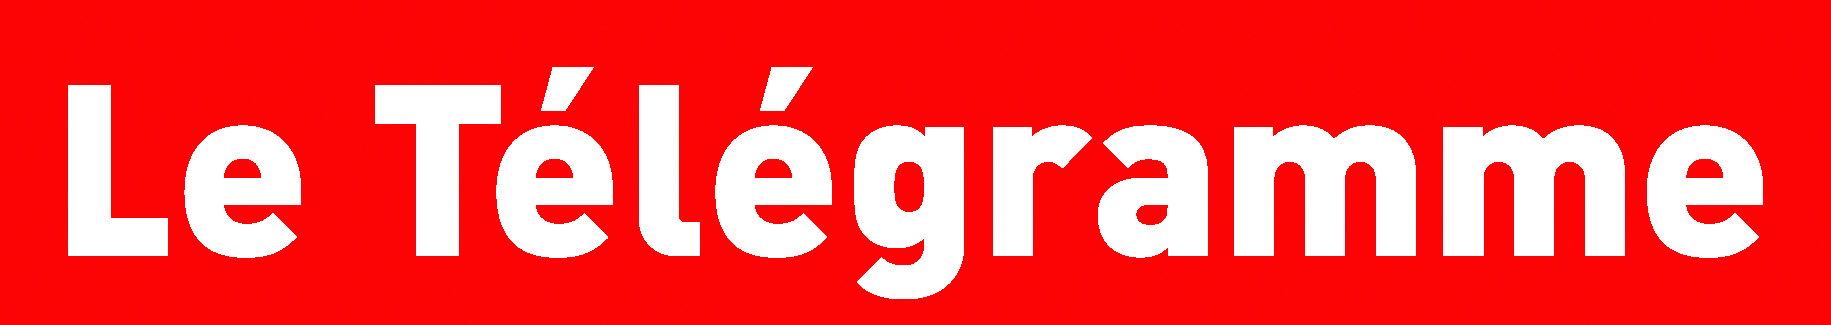 le telegramme-logo